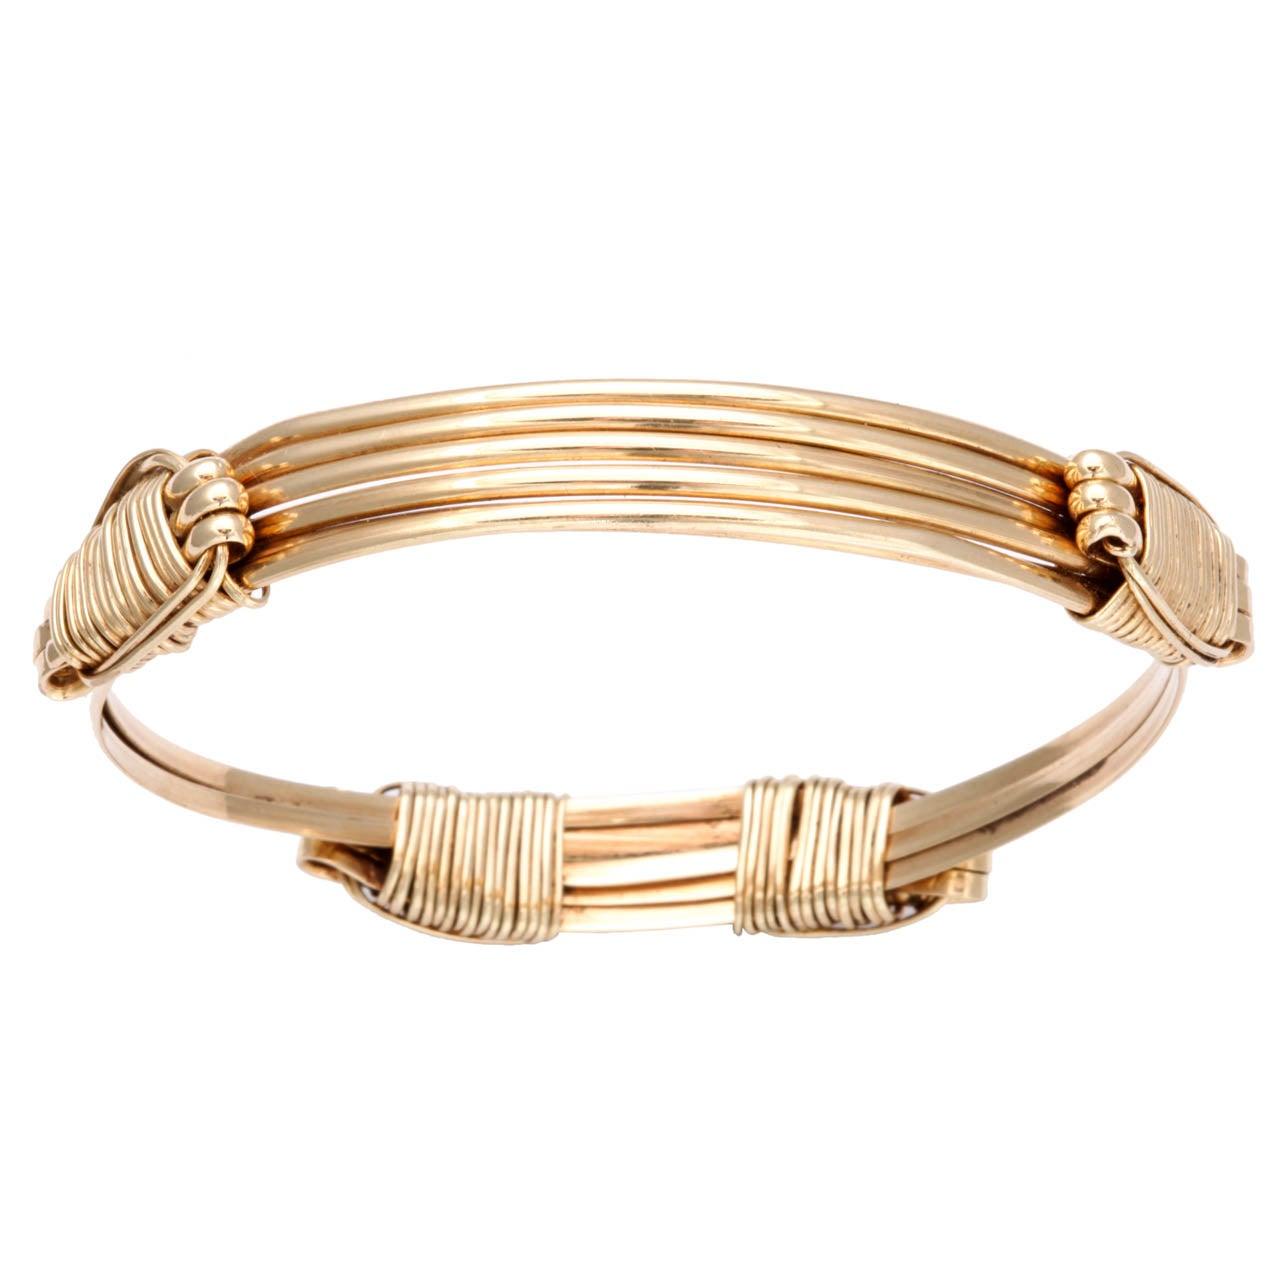 Expandable Gold Elephant S Hair Bracelet At 1stdibs